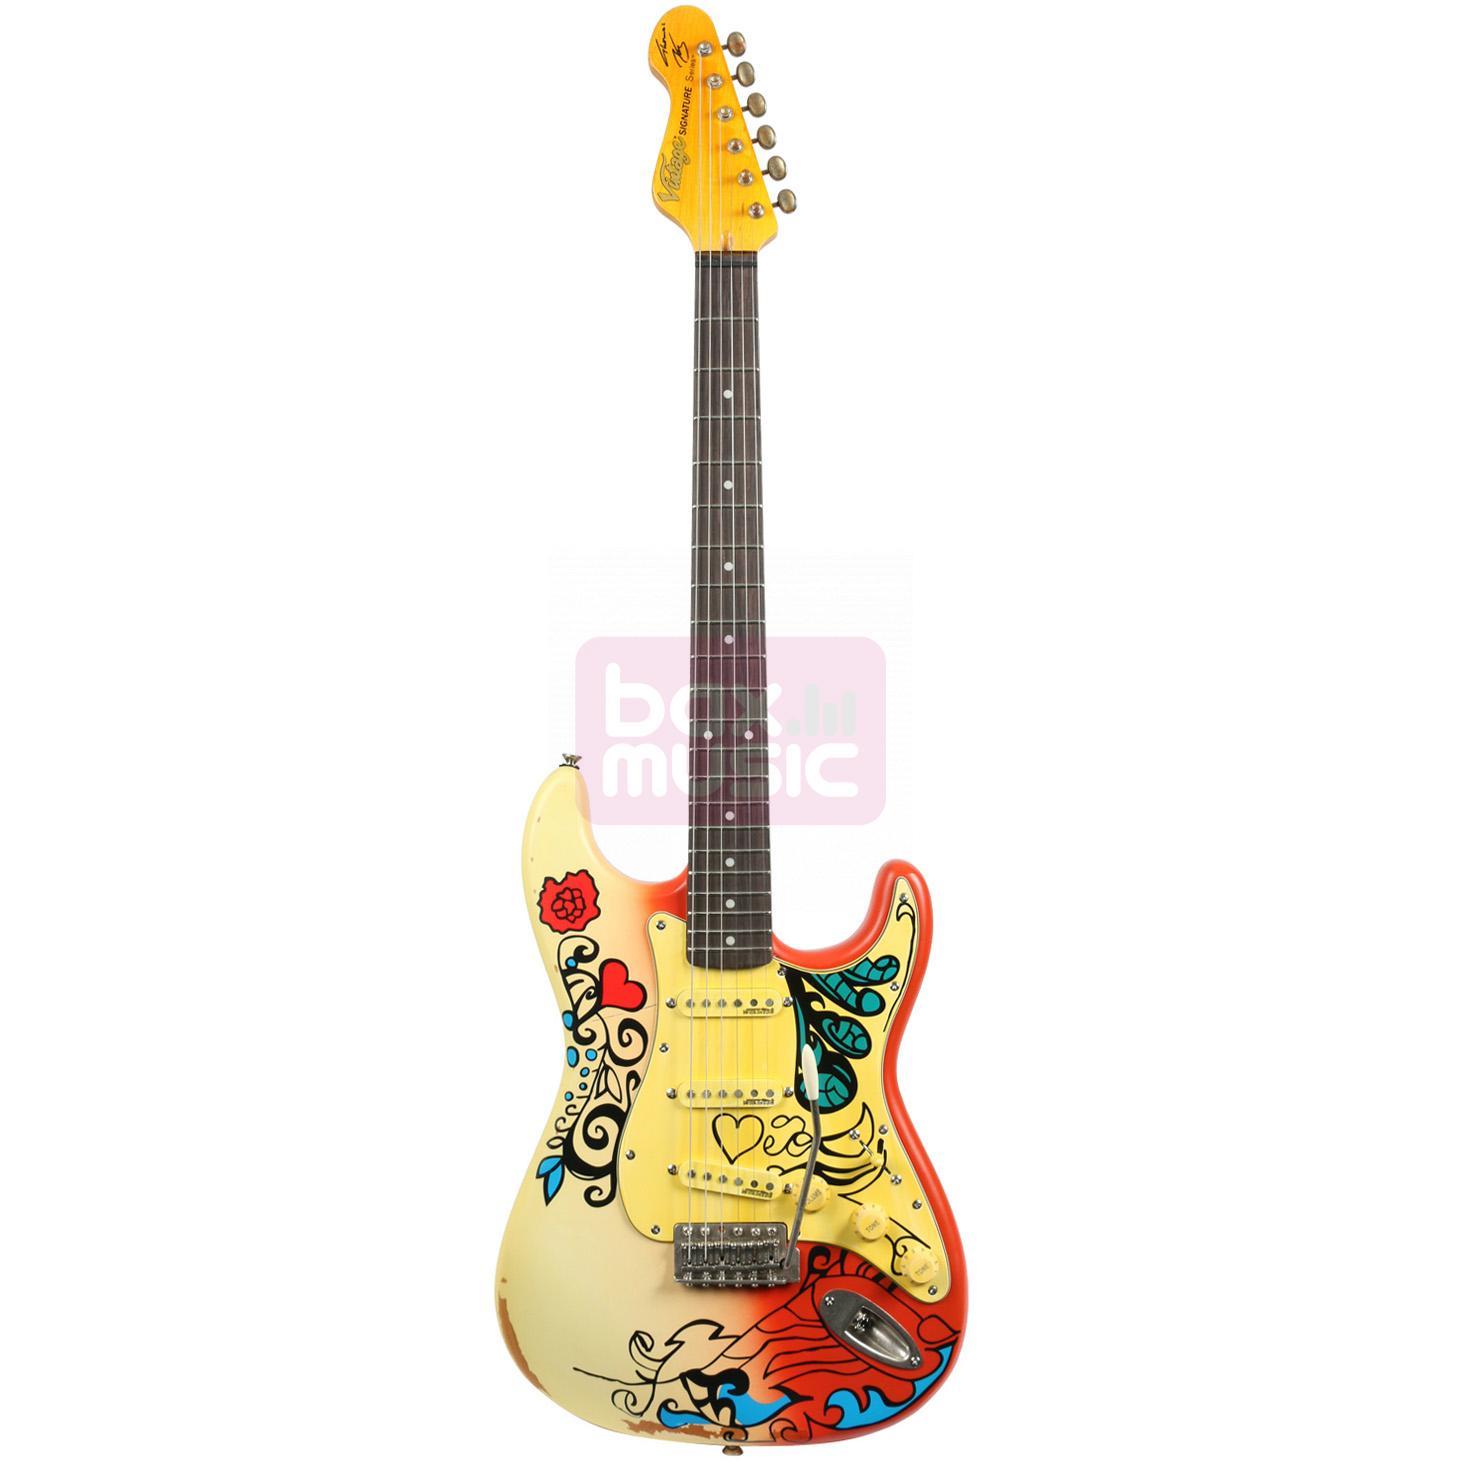 Vintage V6MRHDX Thomas Blug Summer of Love elektrische gitaar